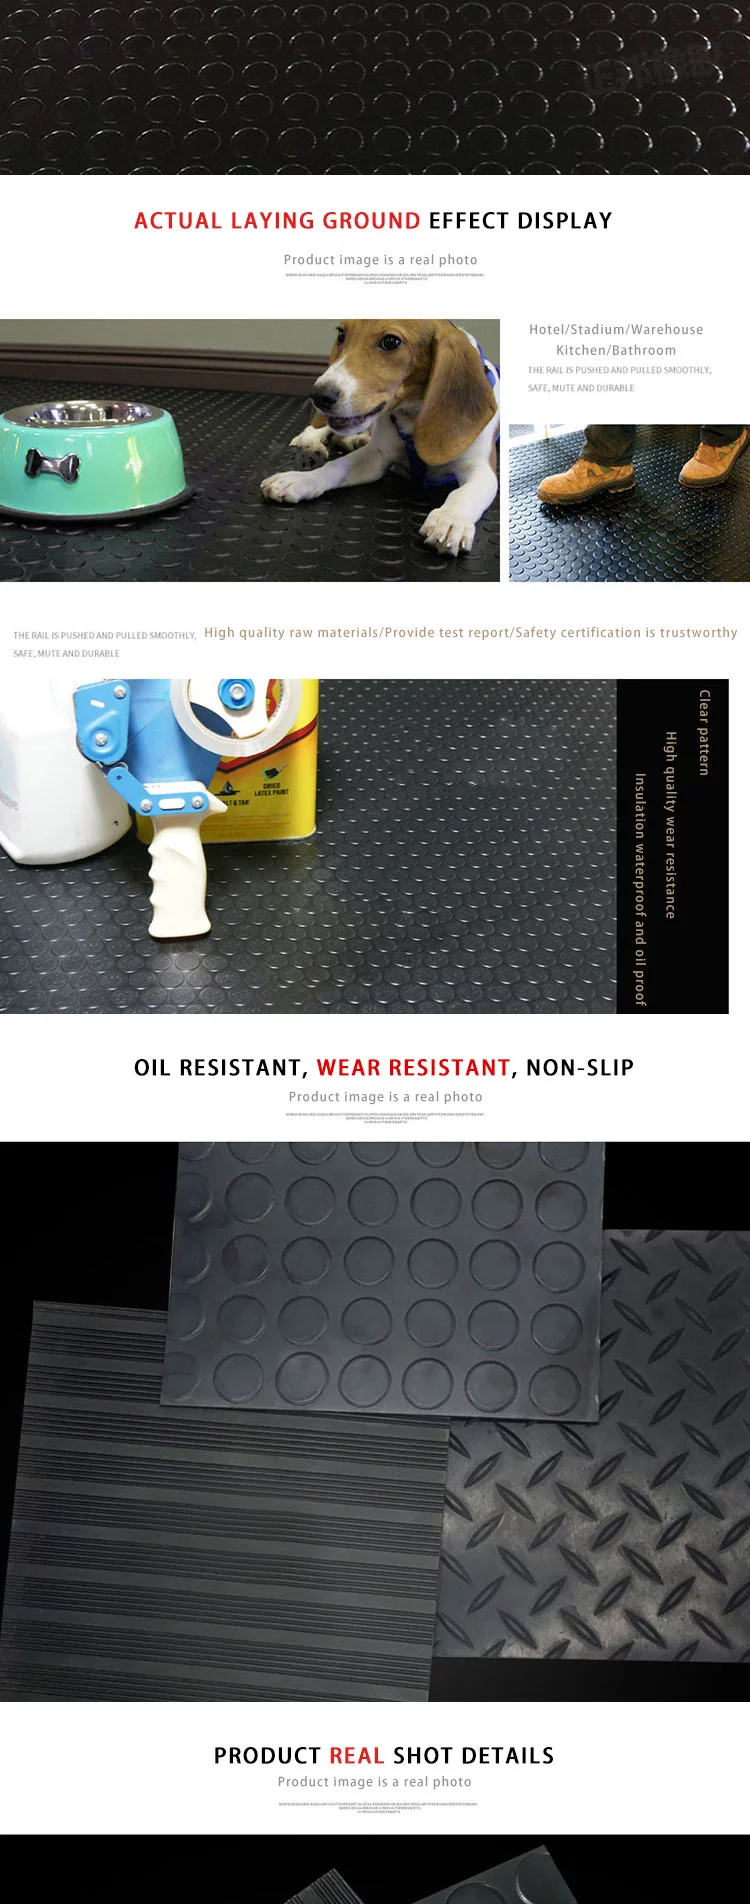 3mm 5mm 6mm 8mm Anti Slip Stud Coin Rubber Flooring Buy Coin Rubber Floor Stud Rubber Flooring Industrial Rubber Floor Mat Pro